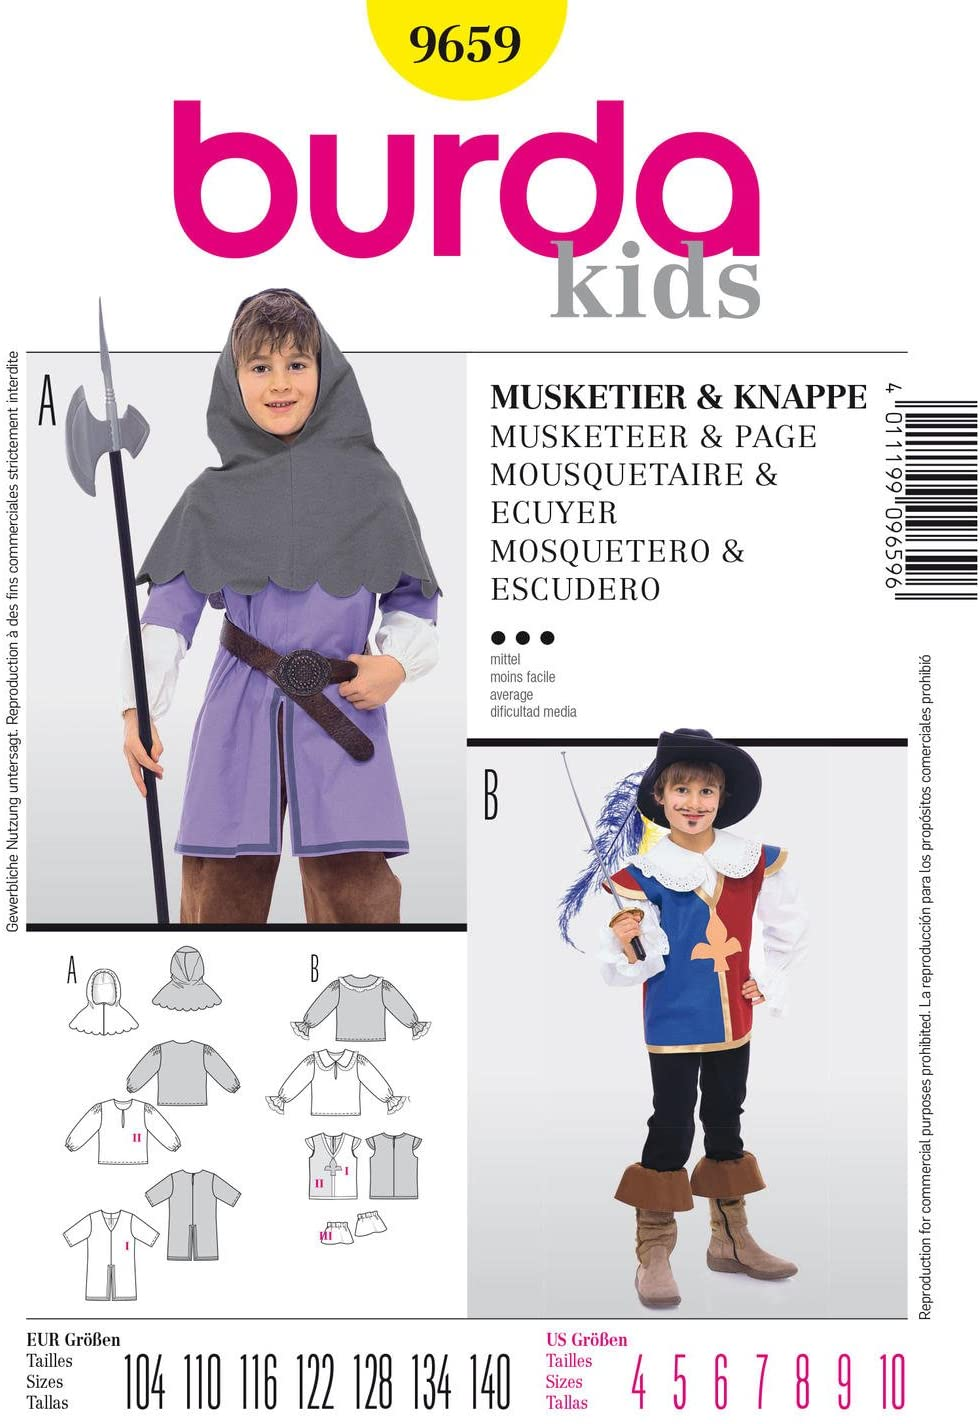 Burda 9659 Schnittmuster Kostüm Fasching Karneval Musketier & Knappe (kids, Gr. 104 - 140) Level 3 mittel